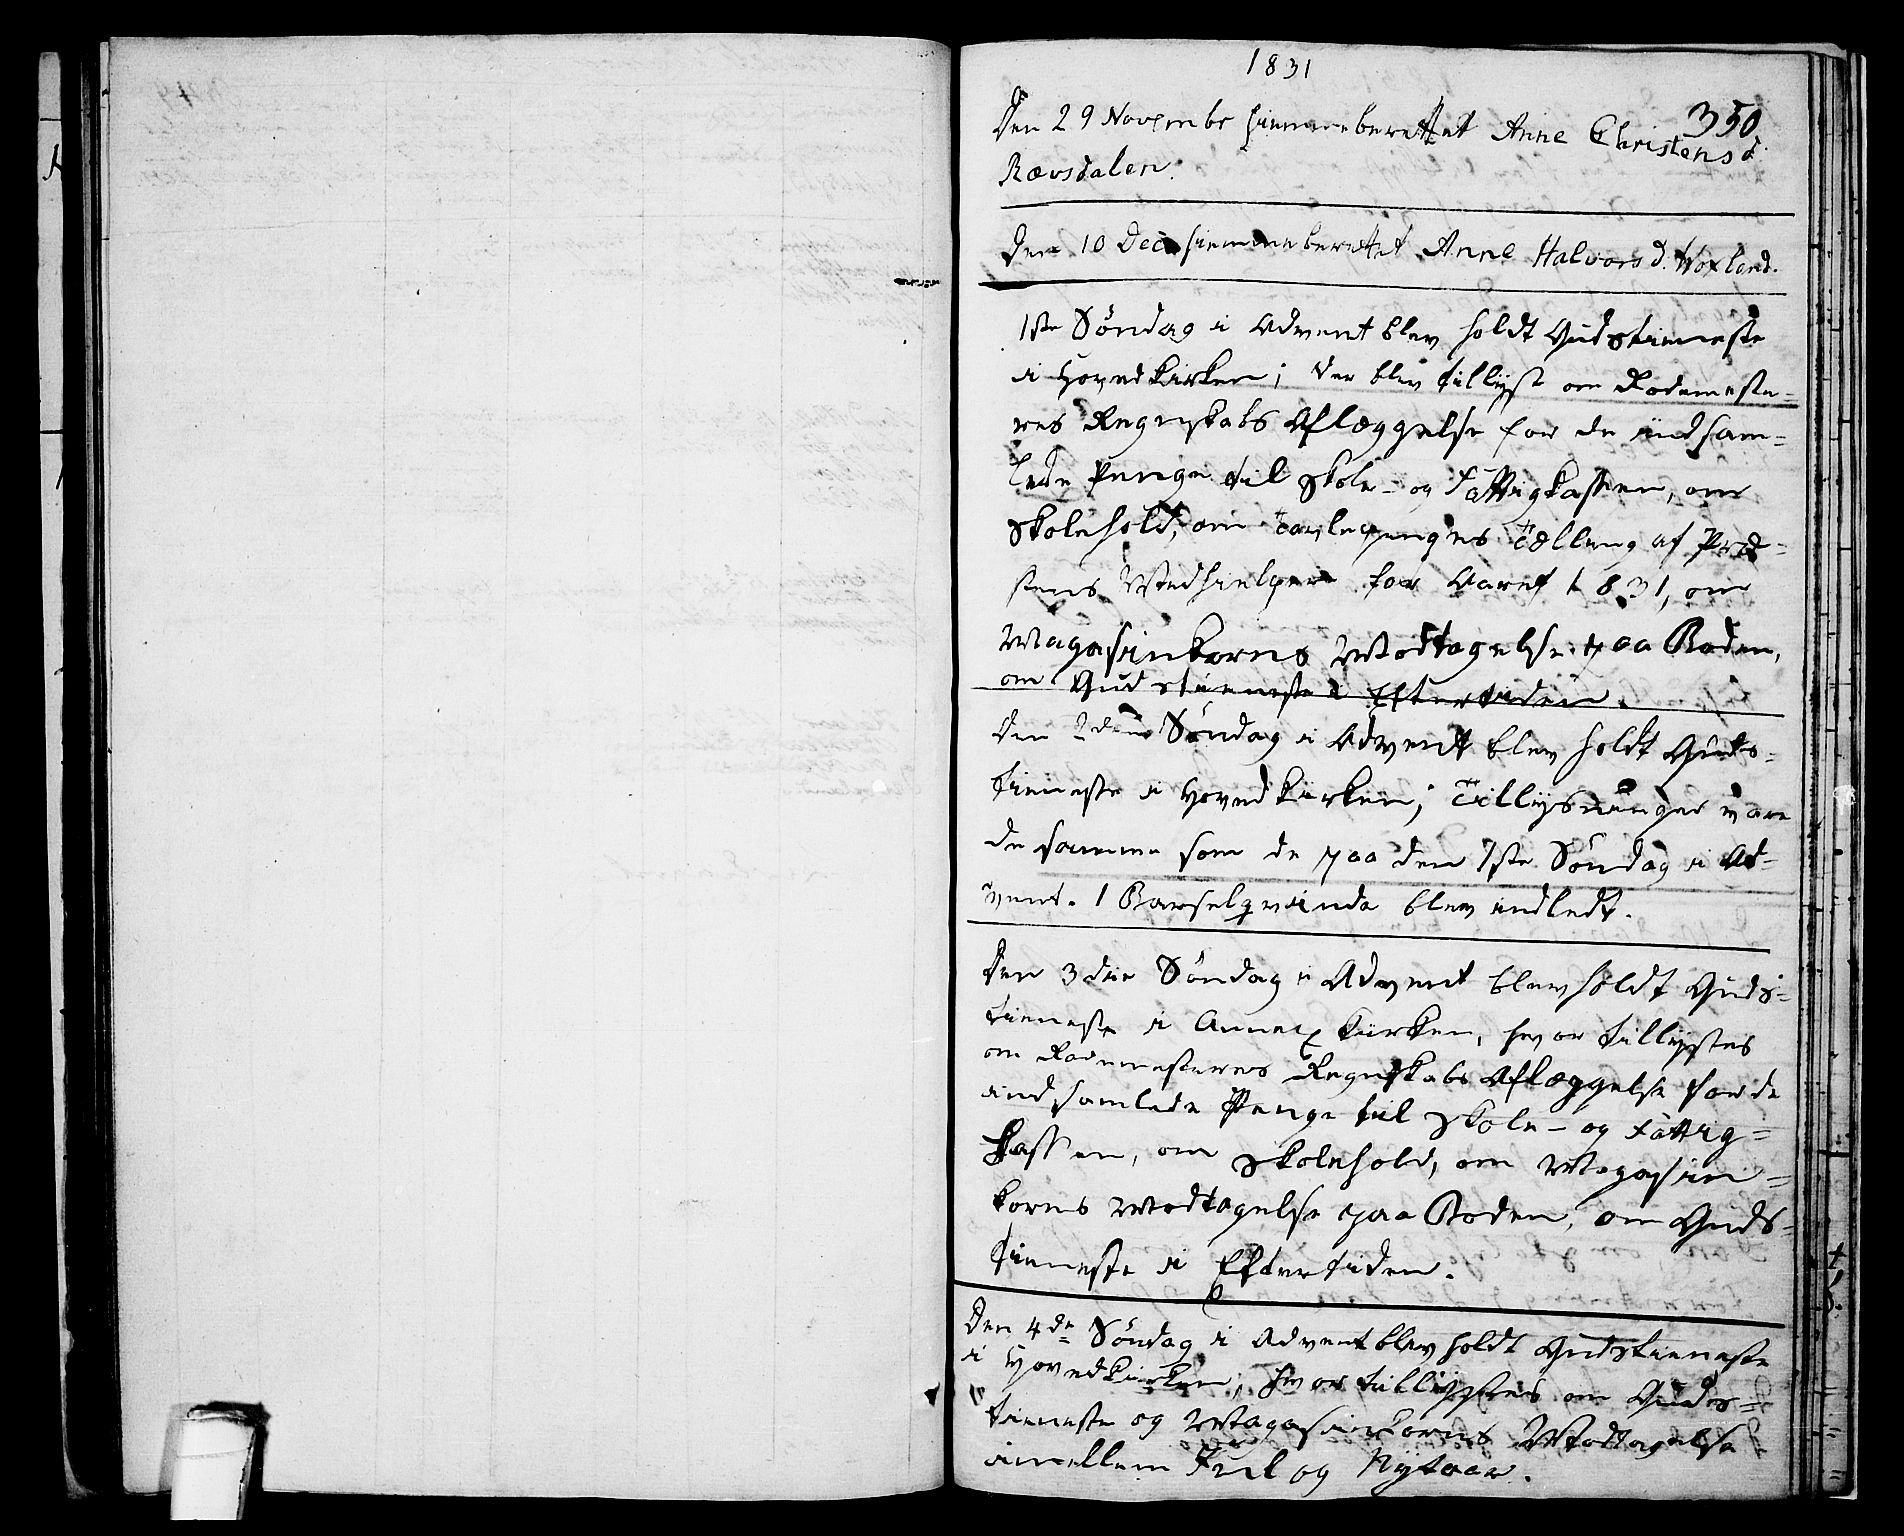 SAKO, Drangedal kirkebøker, F/Fa/L0006: Ministerialbok nr. 6, 1831-1837, s. 350